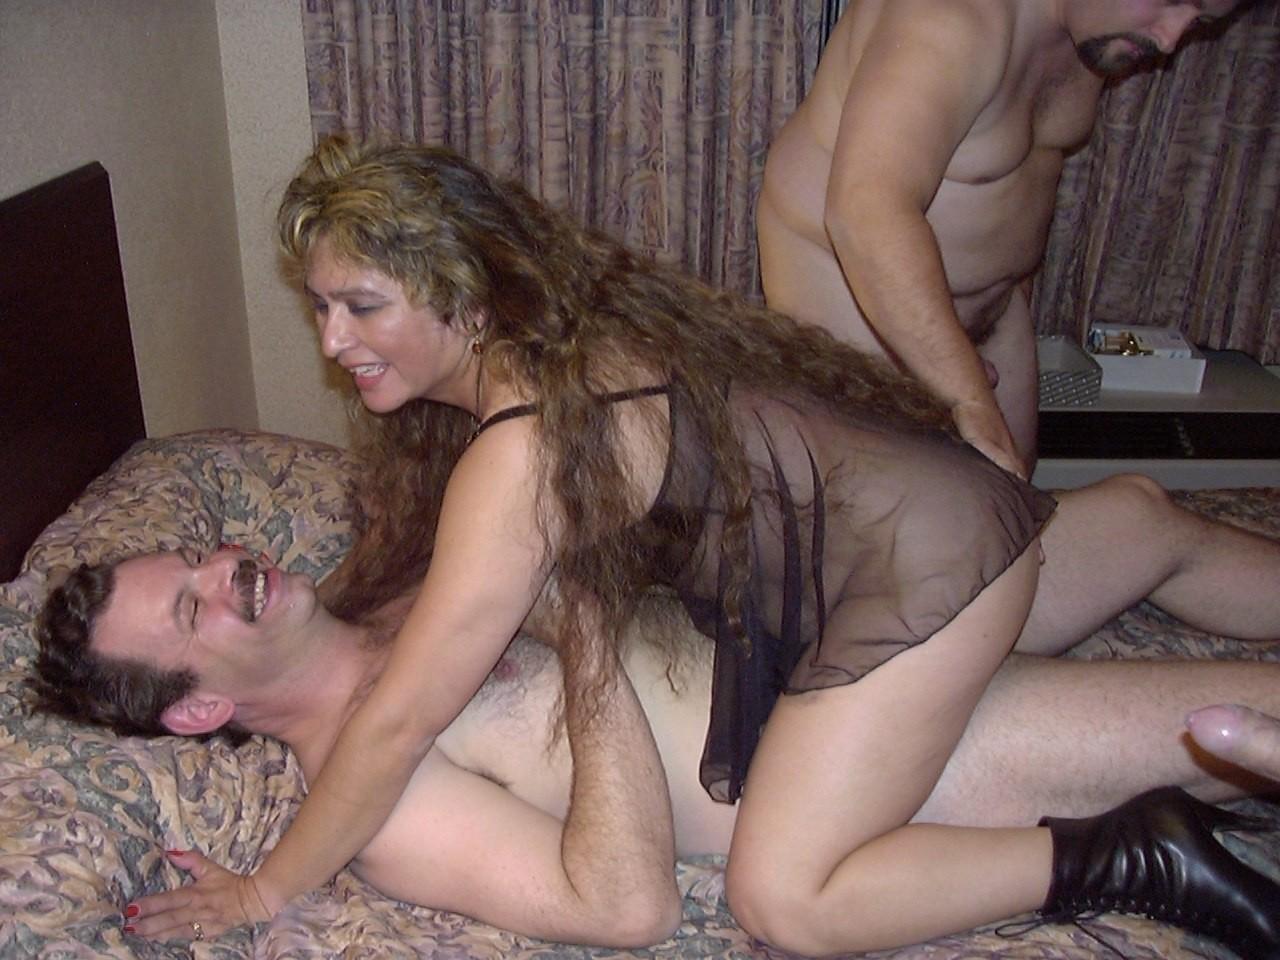 виагра, подробная видео трах замужней порно